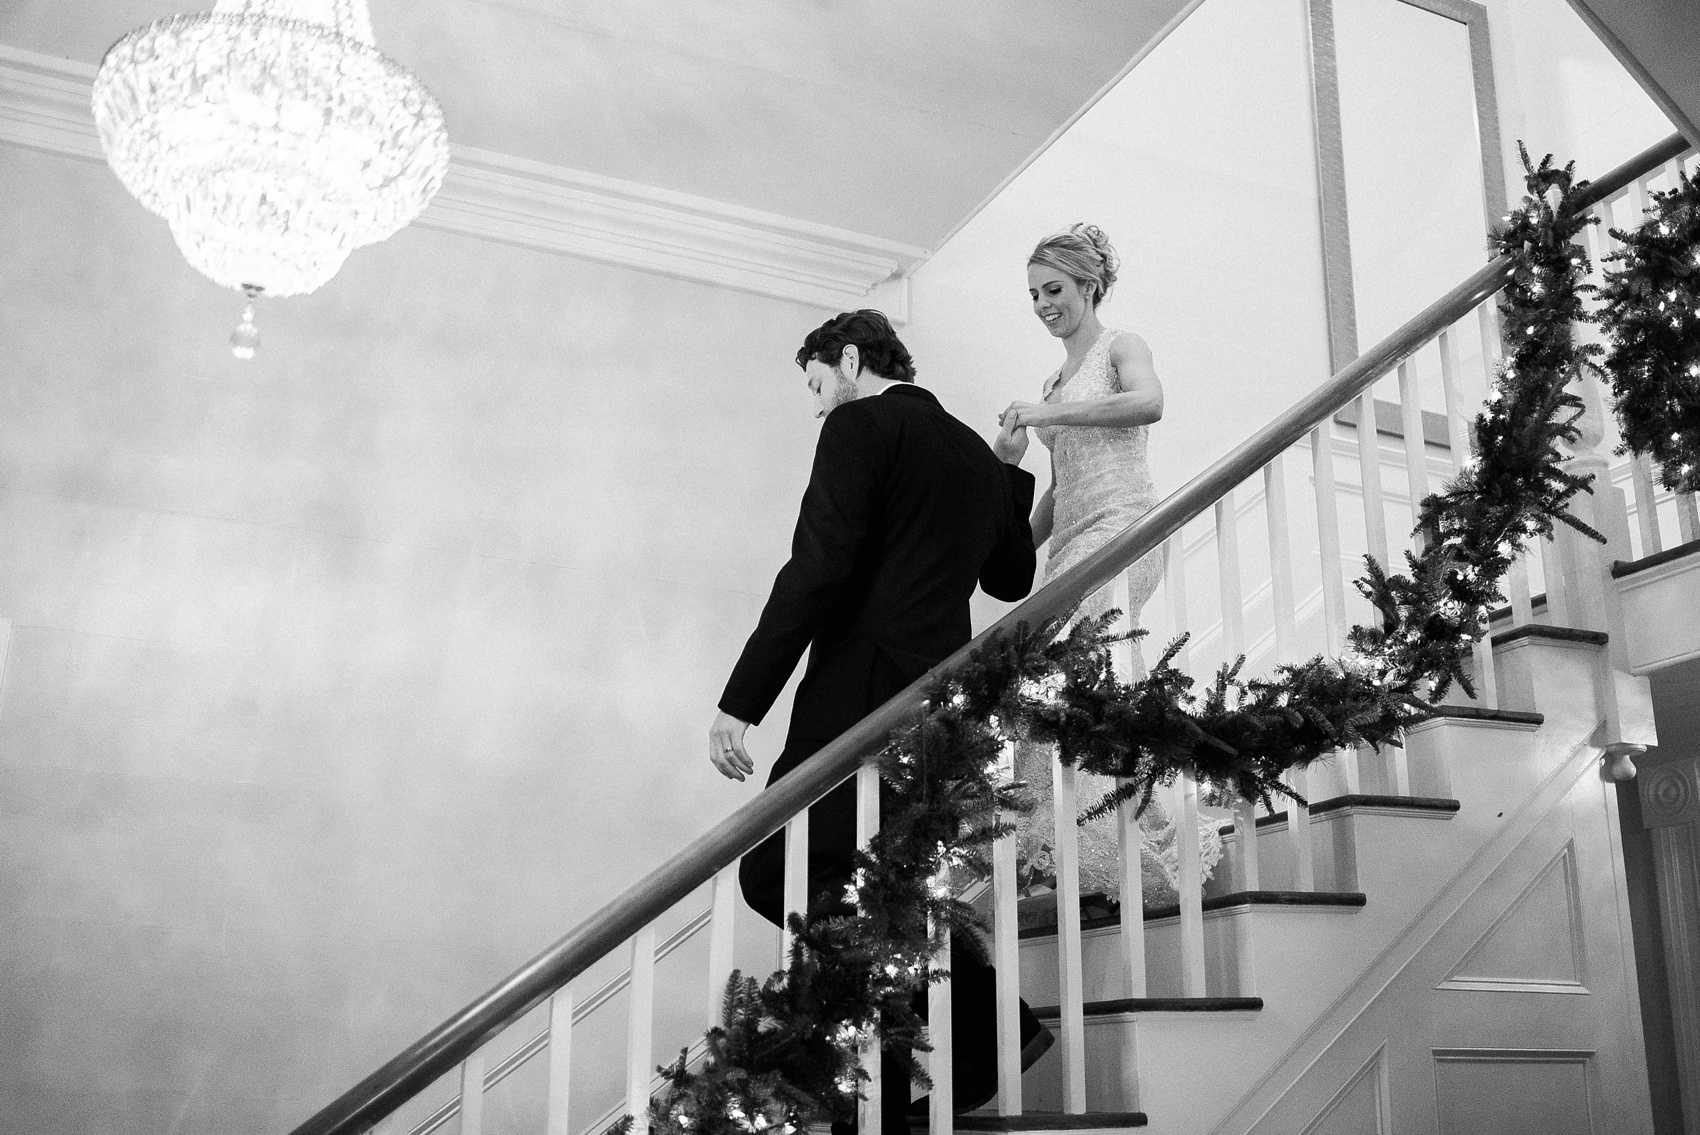 South_carolina_wedding_photographer_0099.jpg